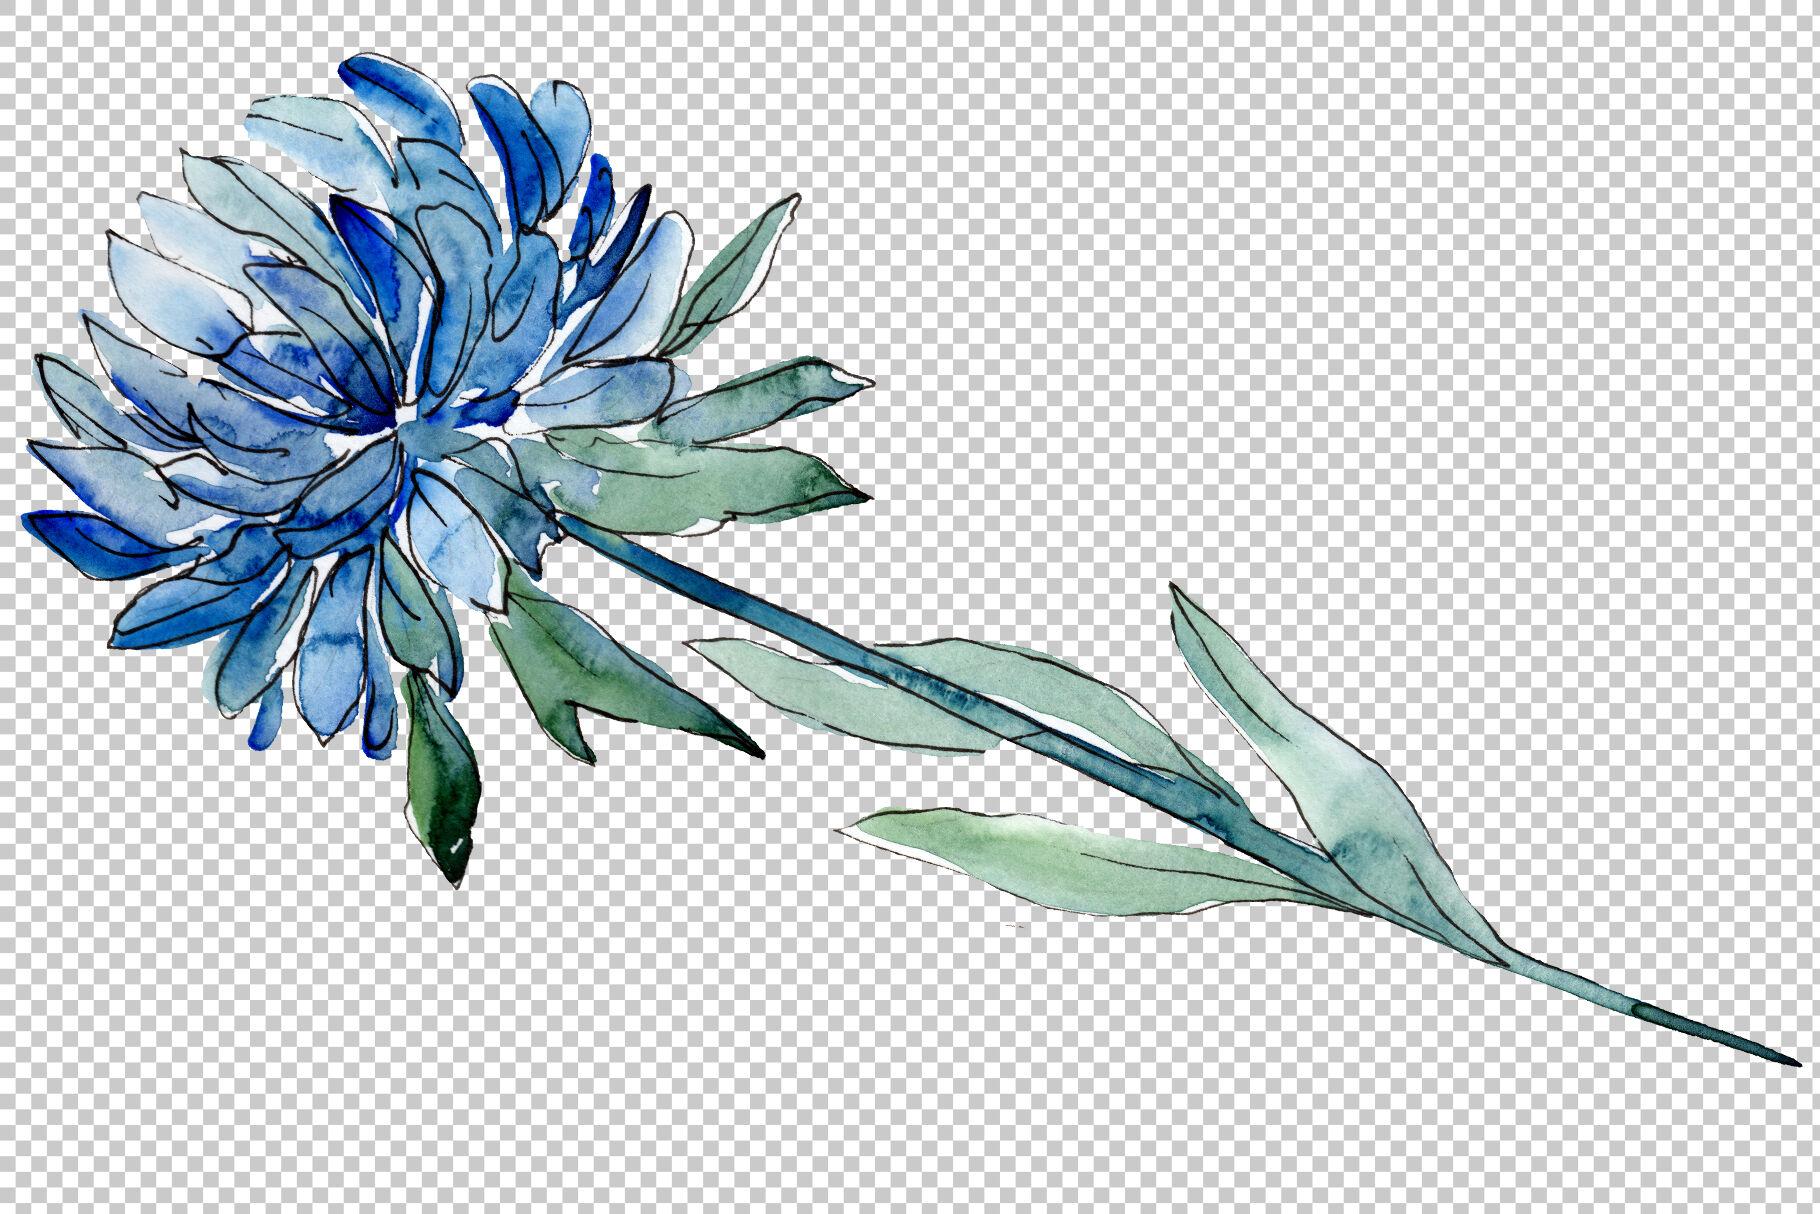 Aster Flowers Strength Of Feelings Watercolor Png By Mystocks